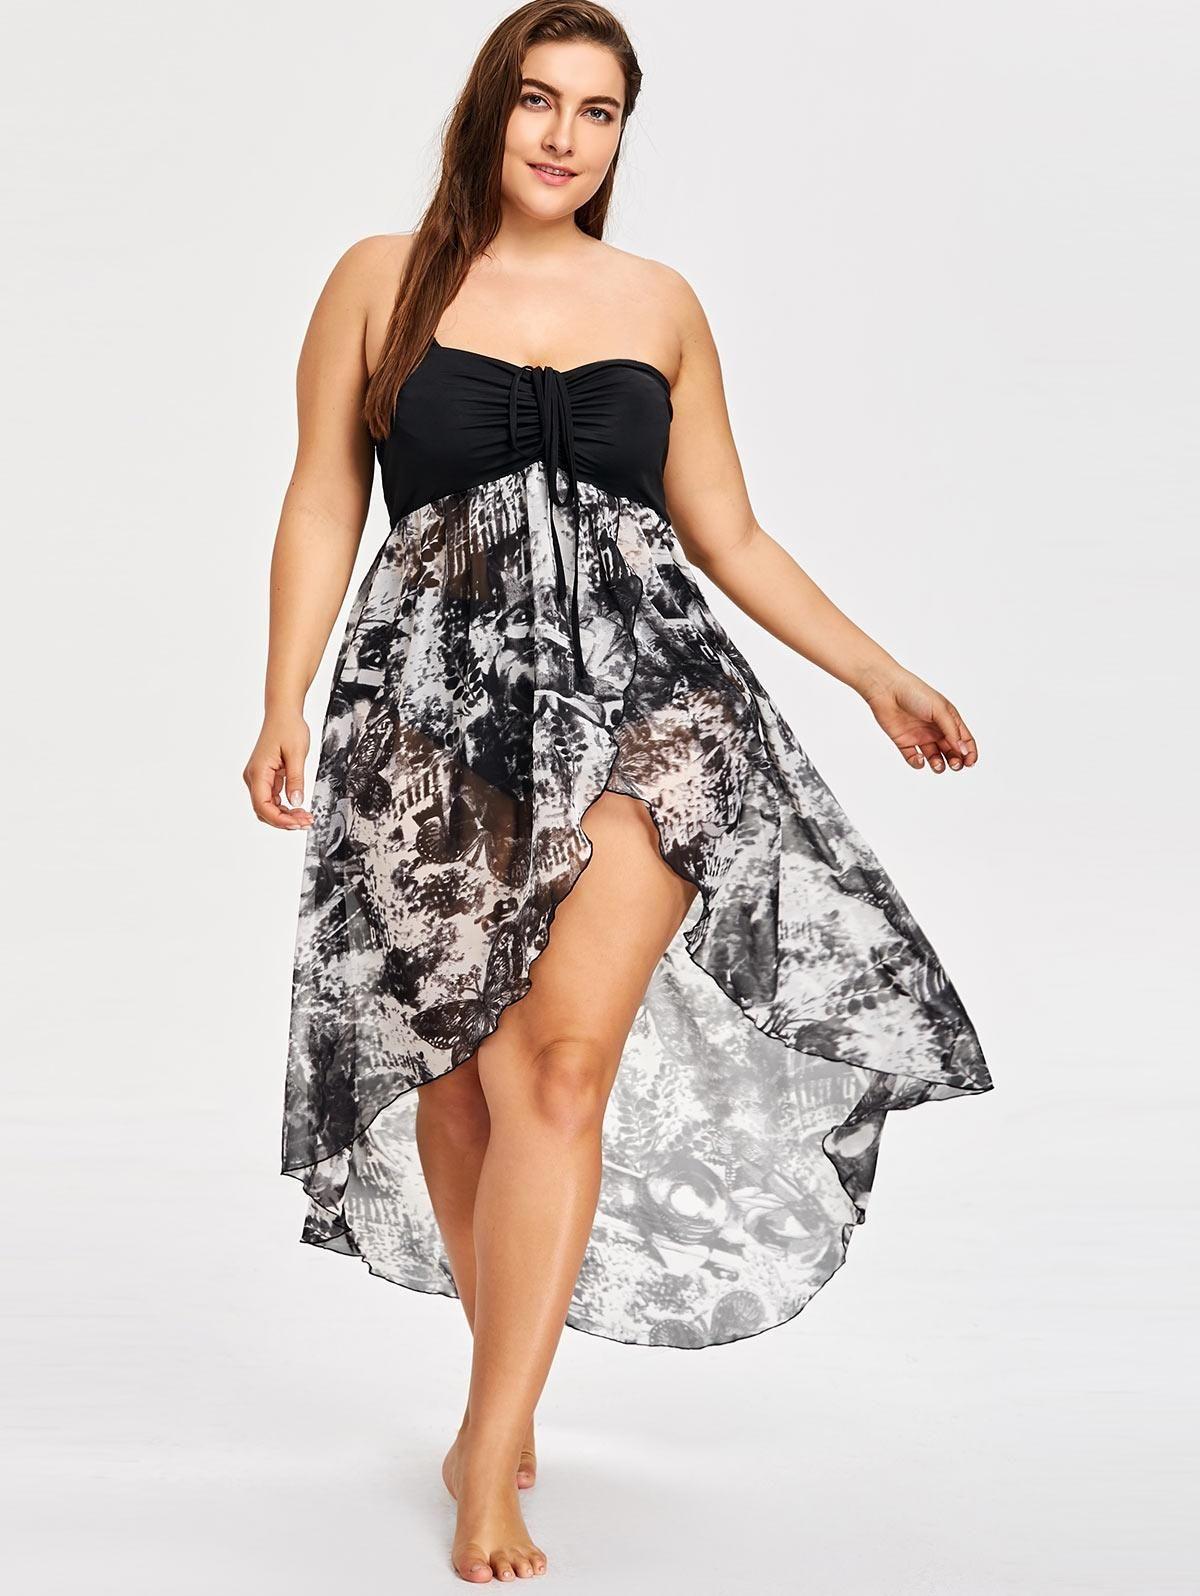 1b037e9f002 2019 Plus Size Boho Maxi Dress For Women Strapless High Low Sexy Party Dress  Summer Sleeveless Casual Beach Big Size 4XL 5XL From Huaijing